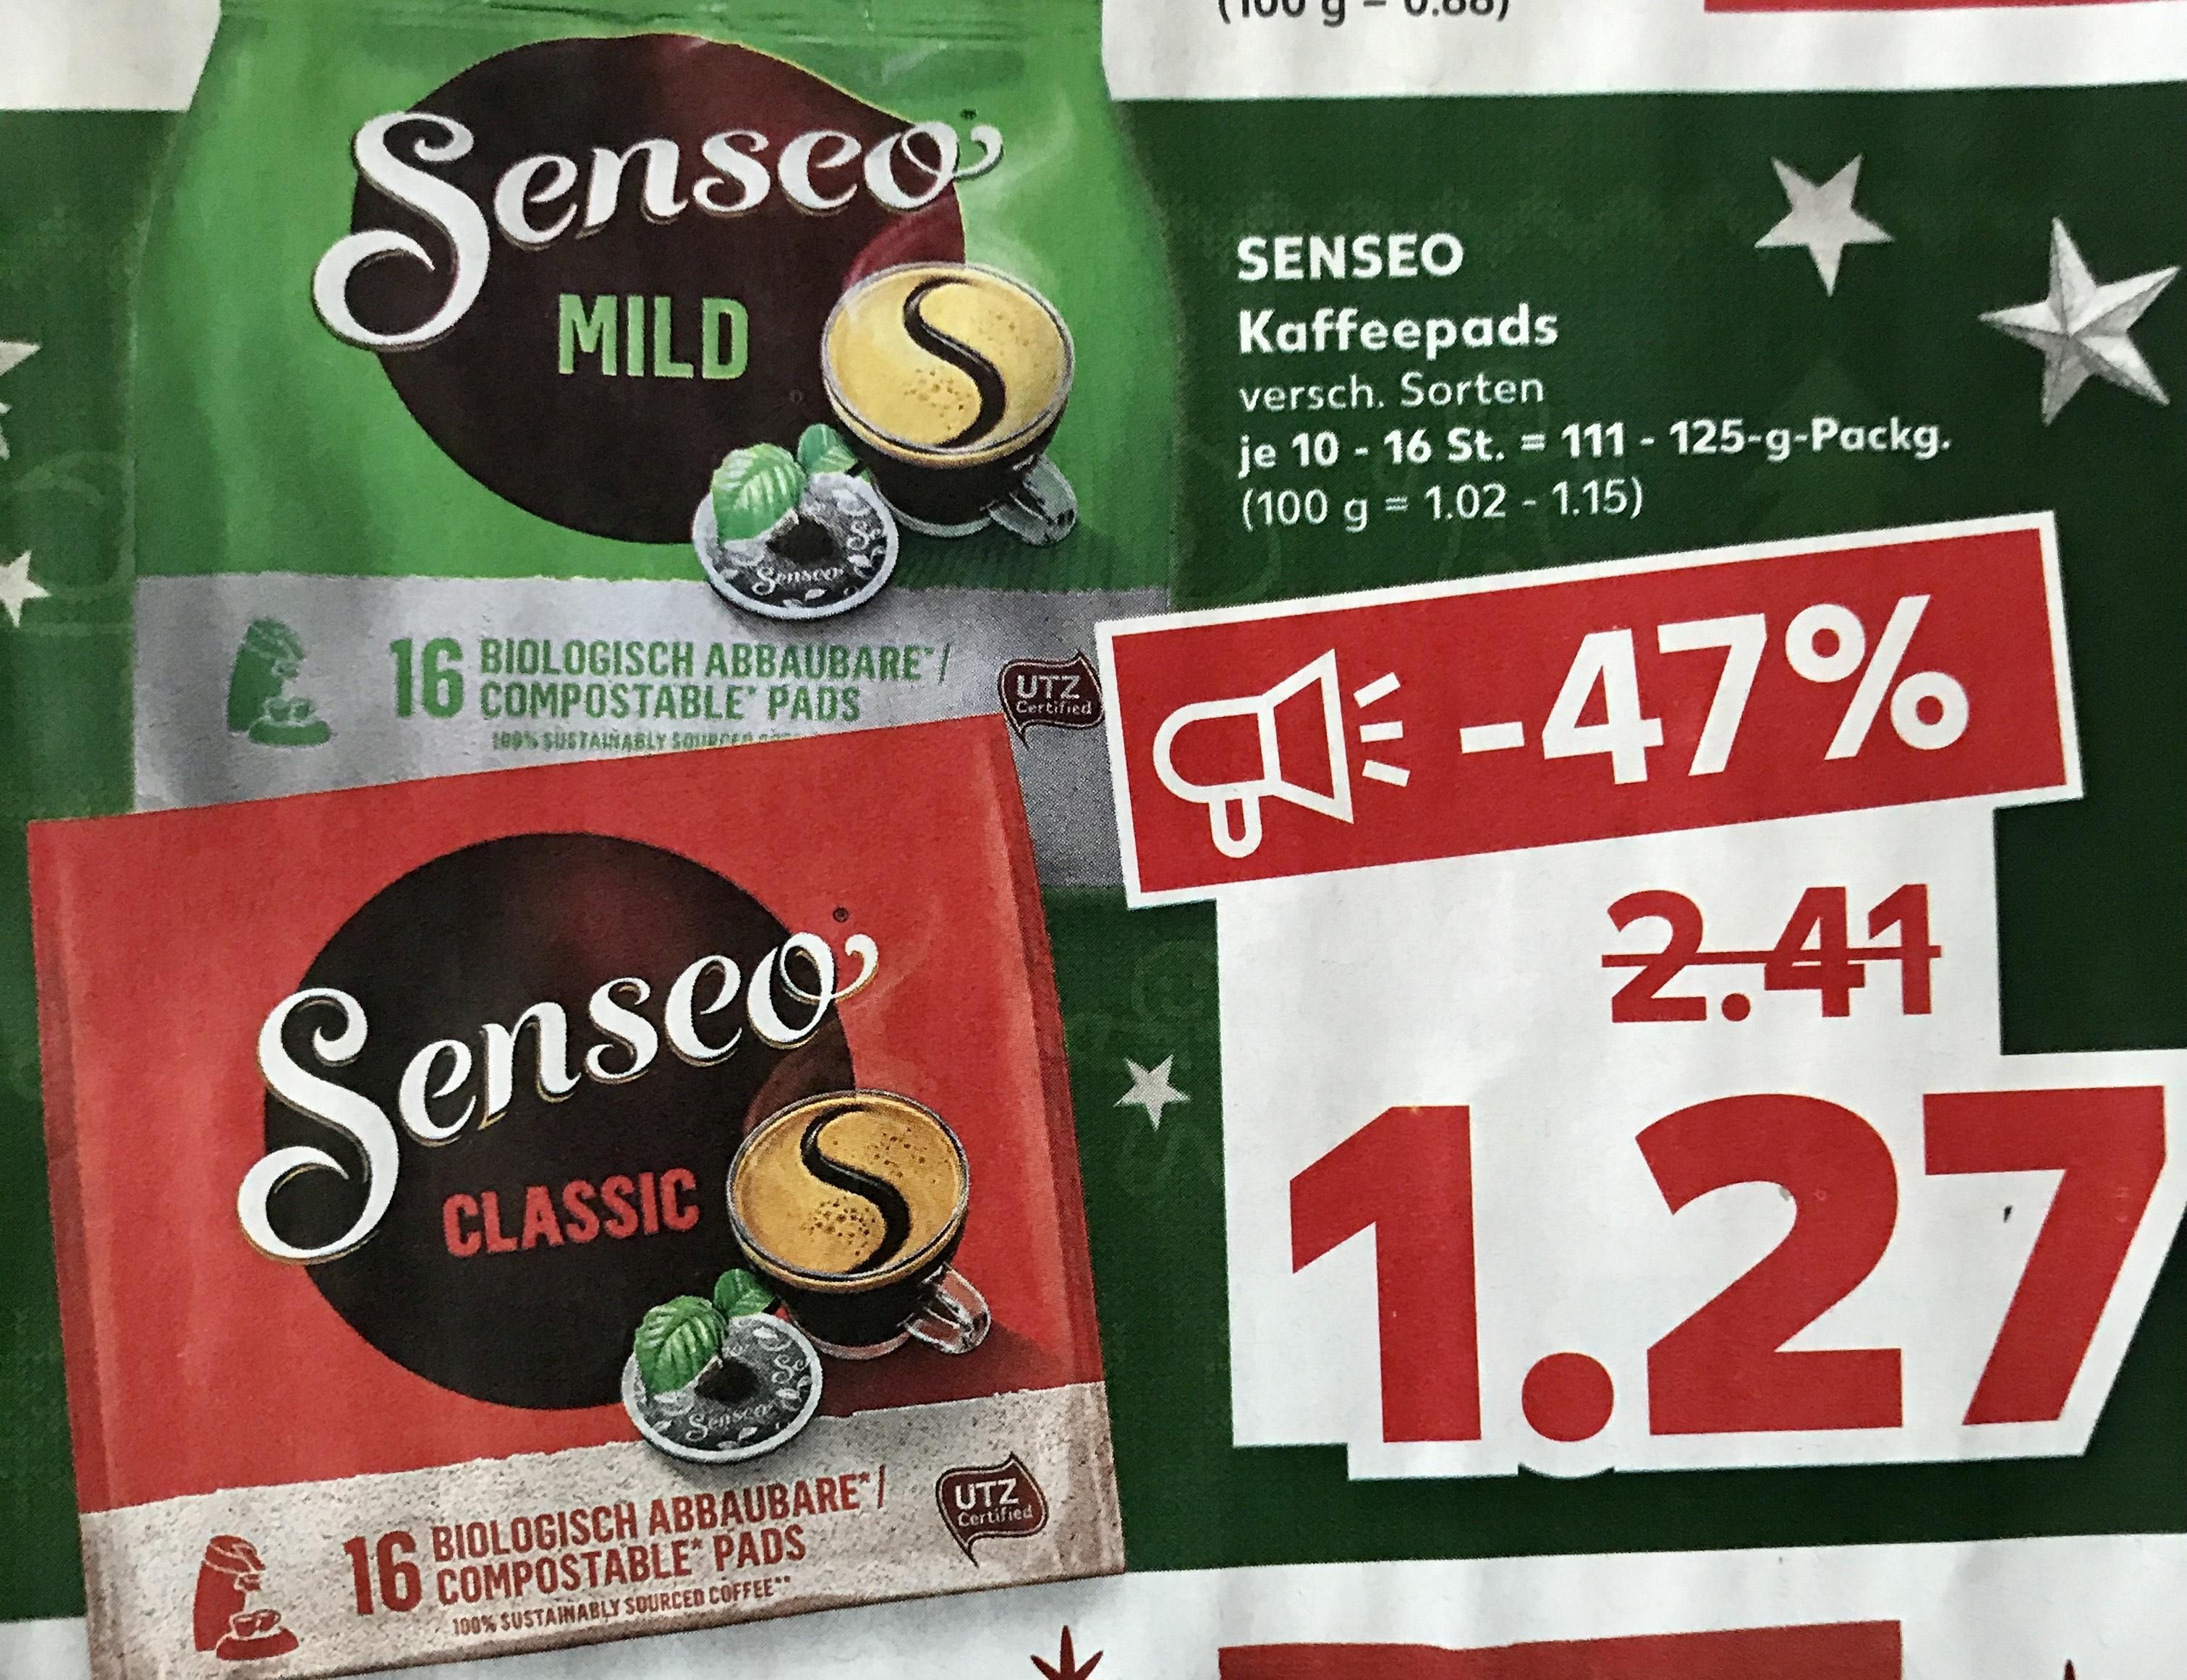 SENSEO Kaffeepads | verschiedene Sorten | Kaufland ️